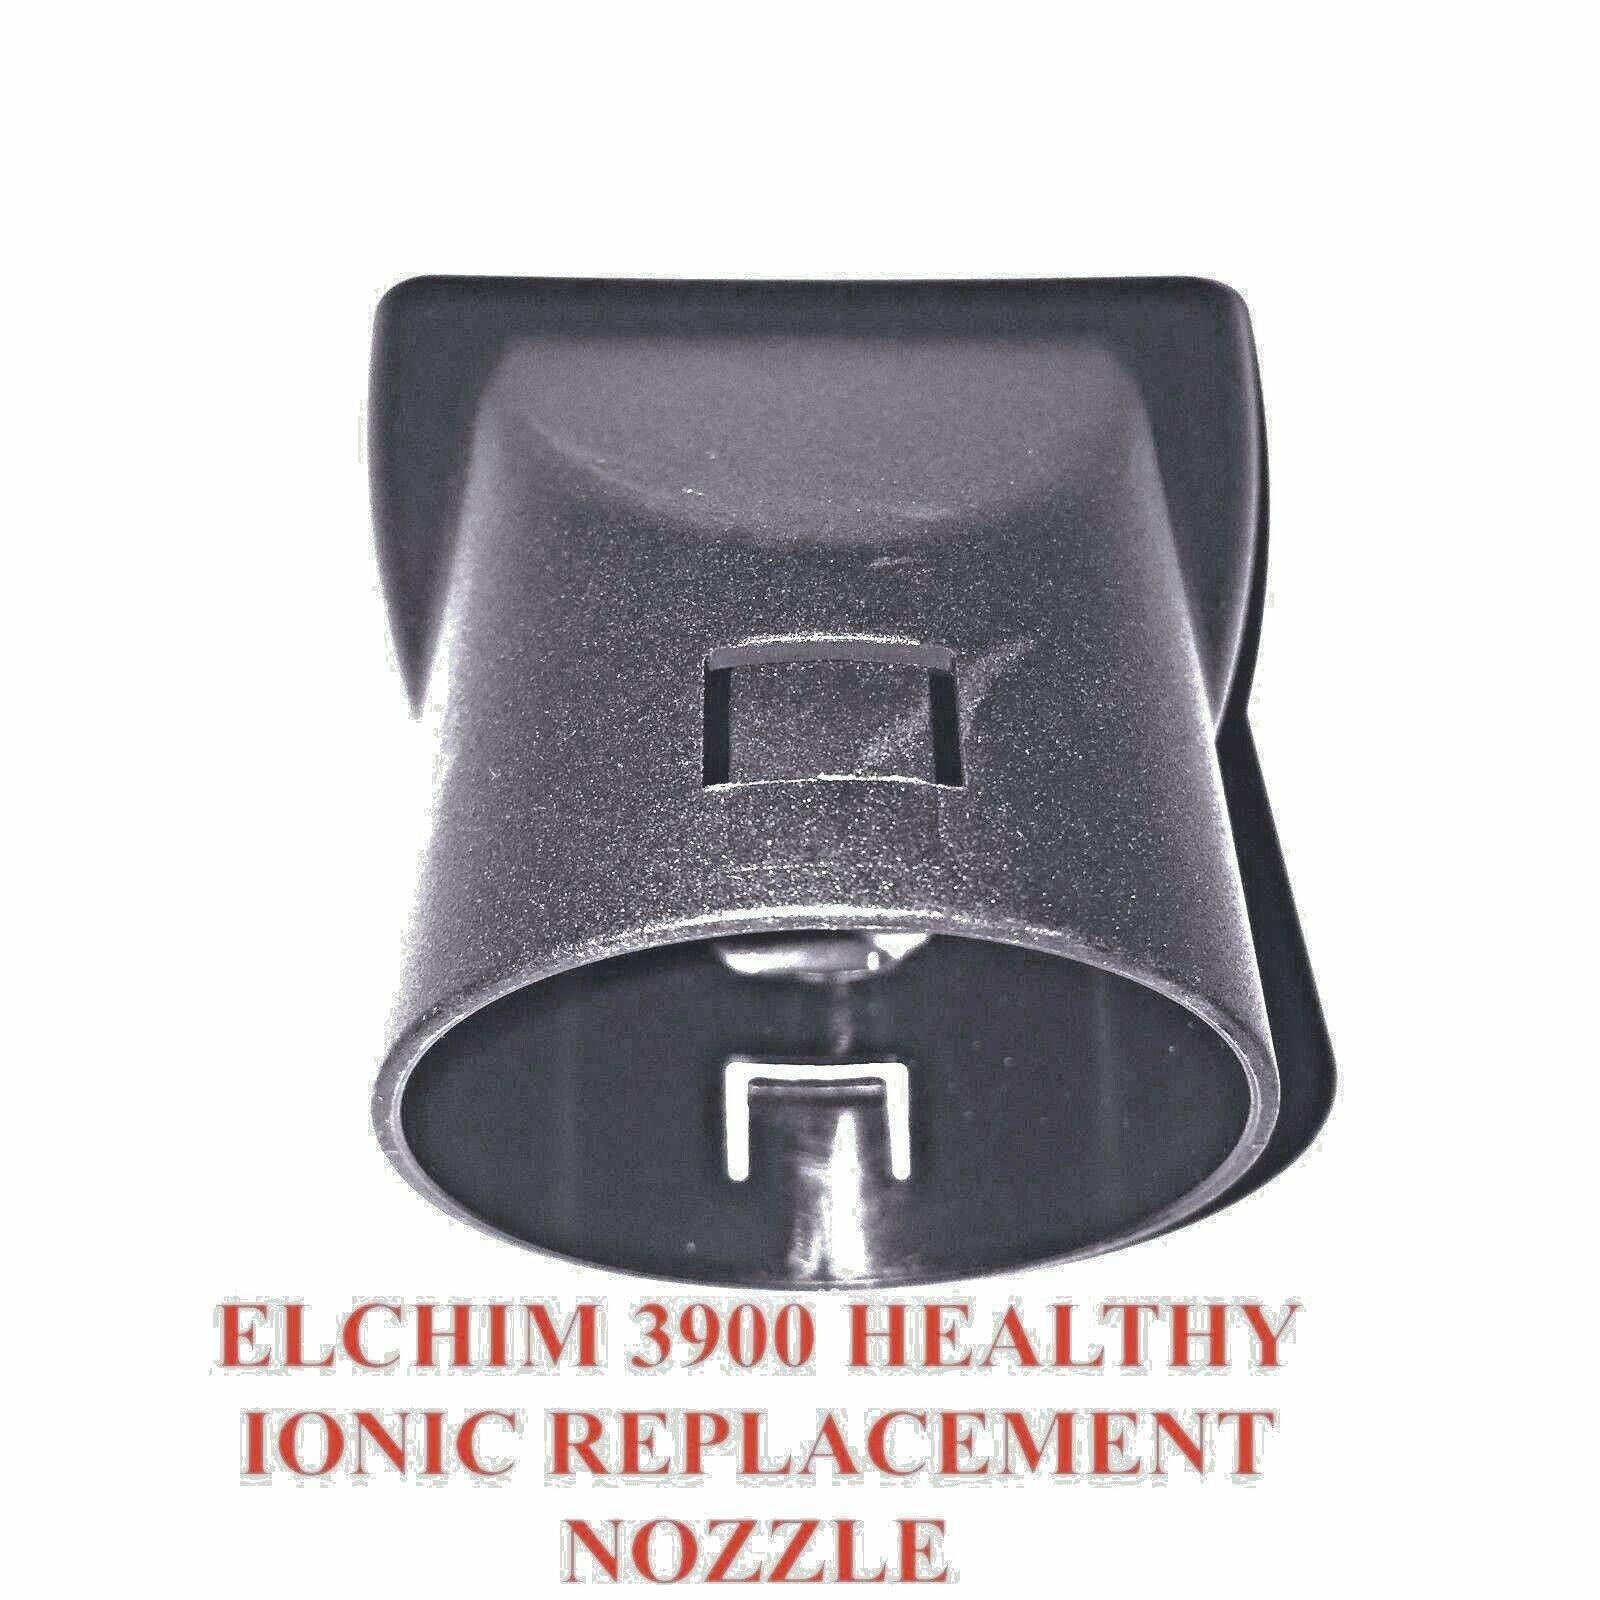 ELCHIM 35% LIGHTER IONIC-DRYER & DIFFUSER 2200W LIFETIME WAR